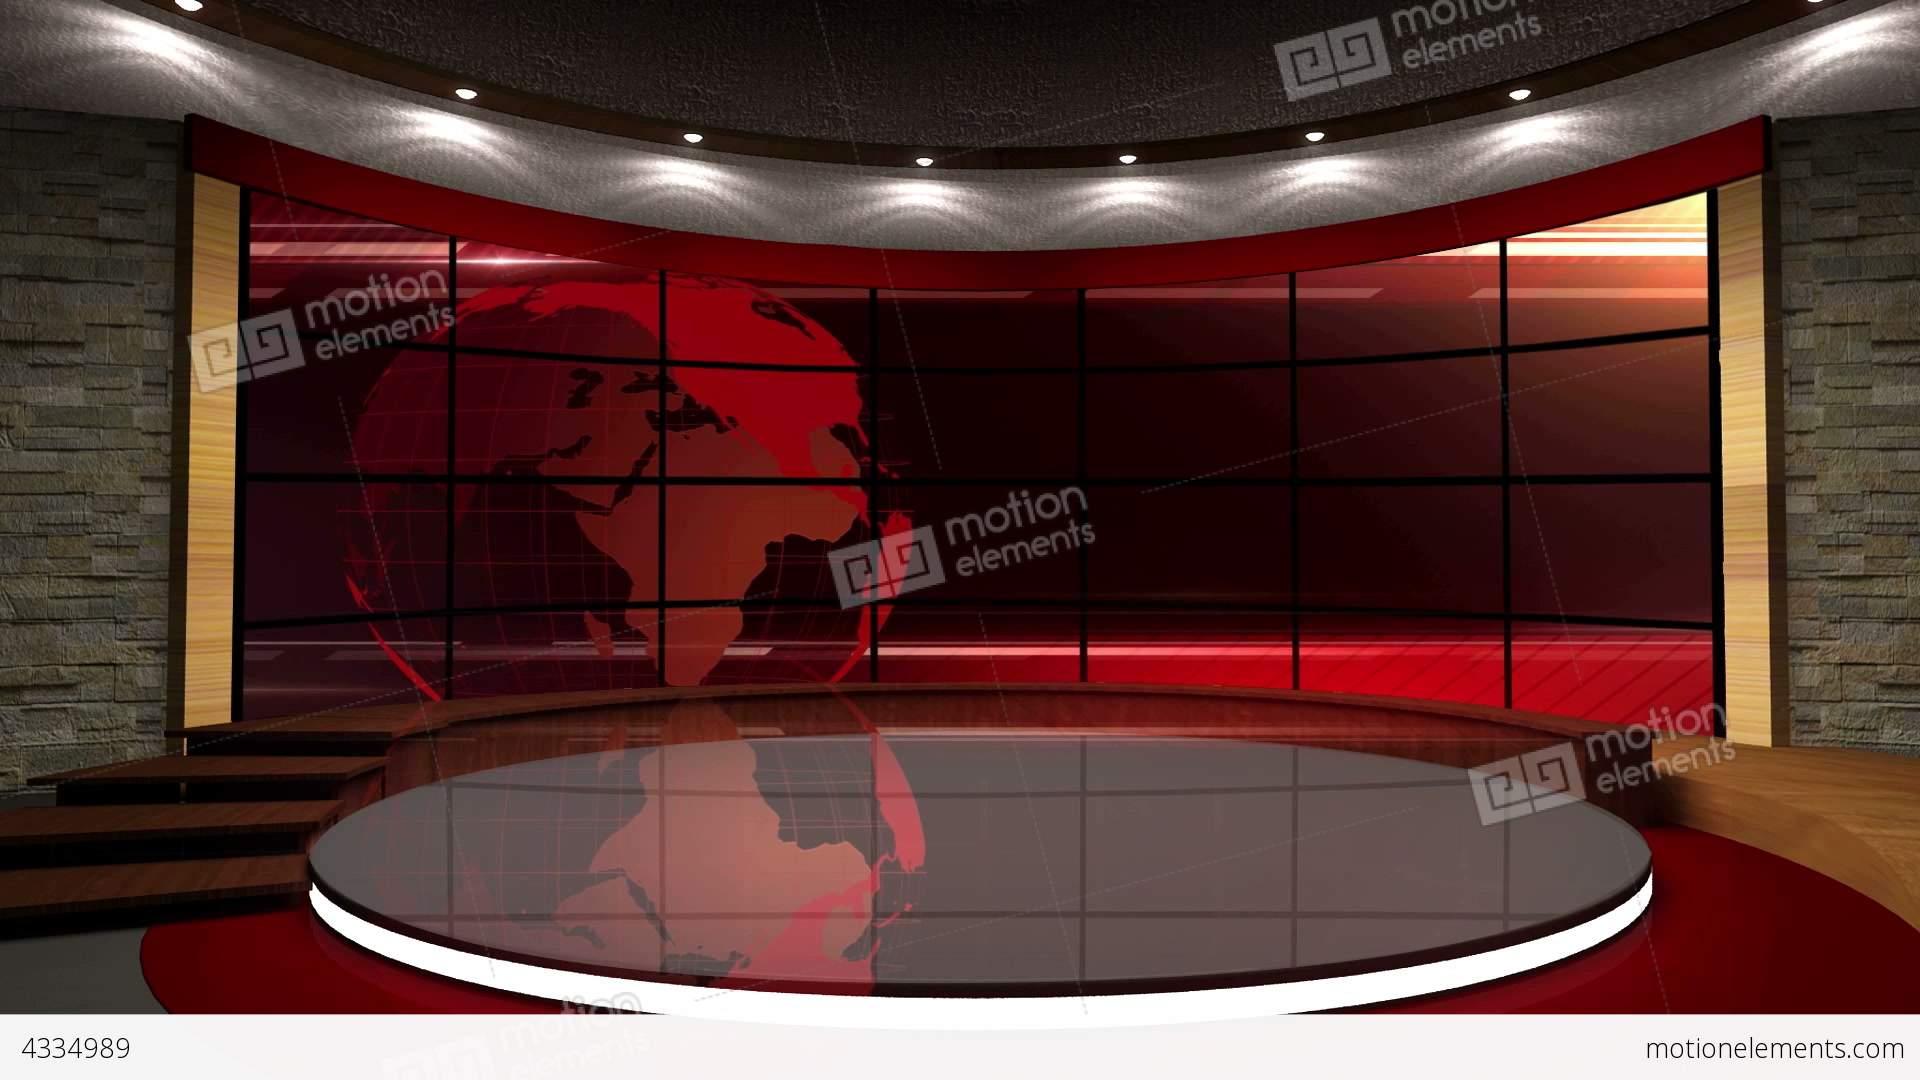 Studio 06 news tv studio set 06 - virtual background loop stock video footage